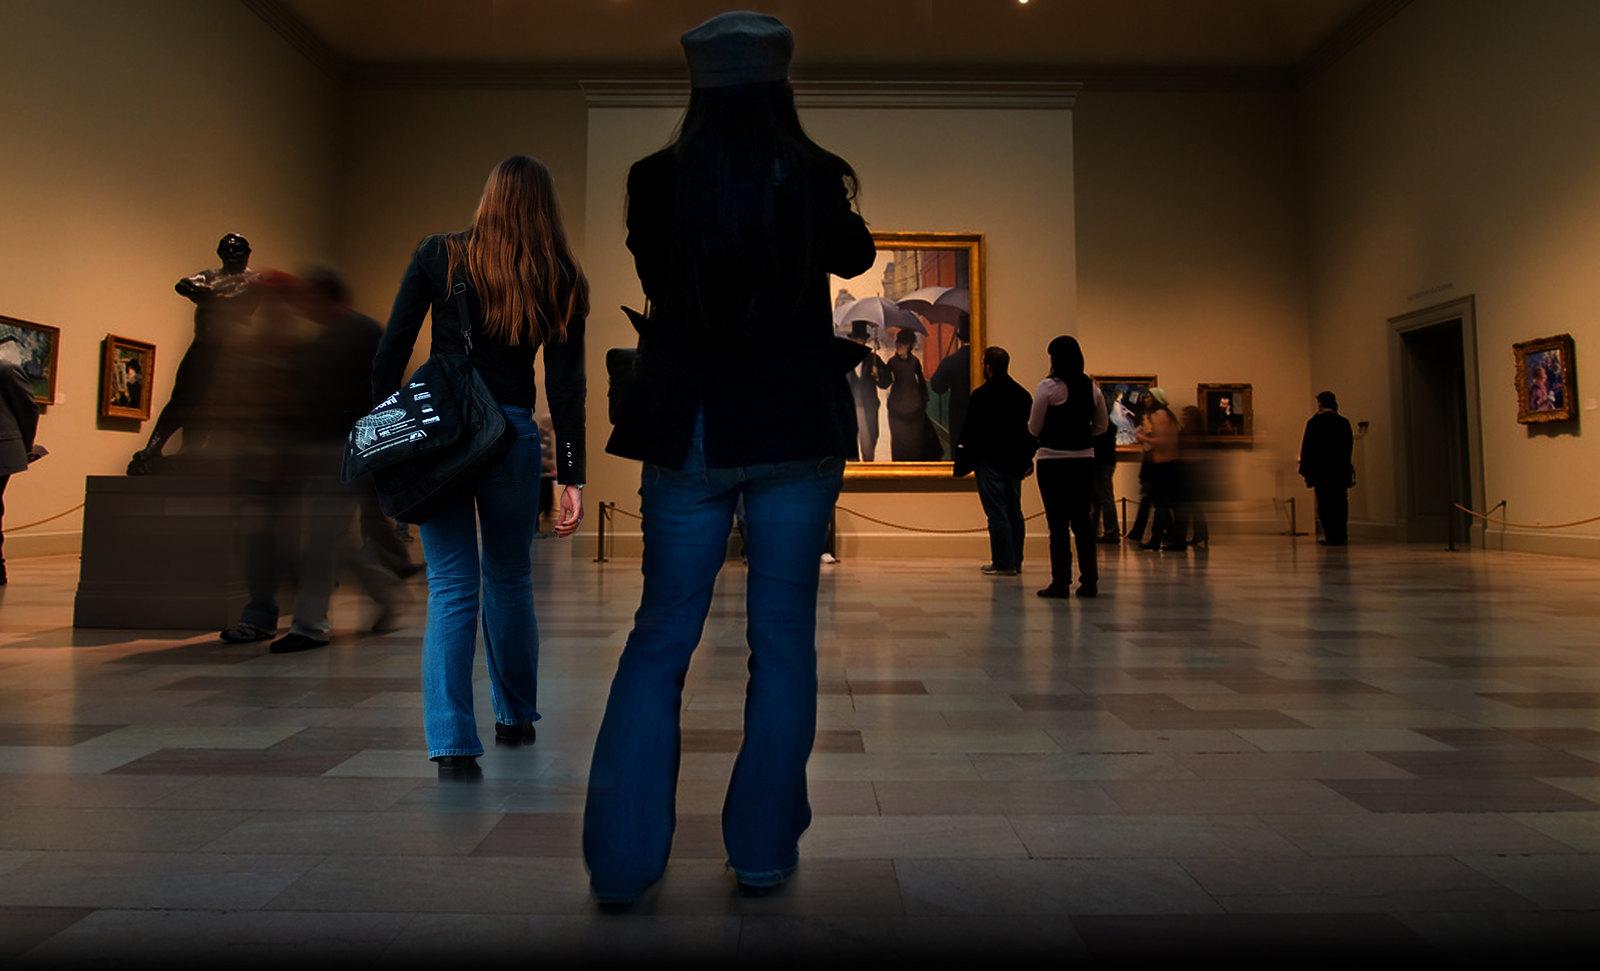 Instituto de Arte de Chicago